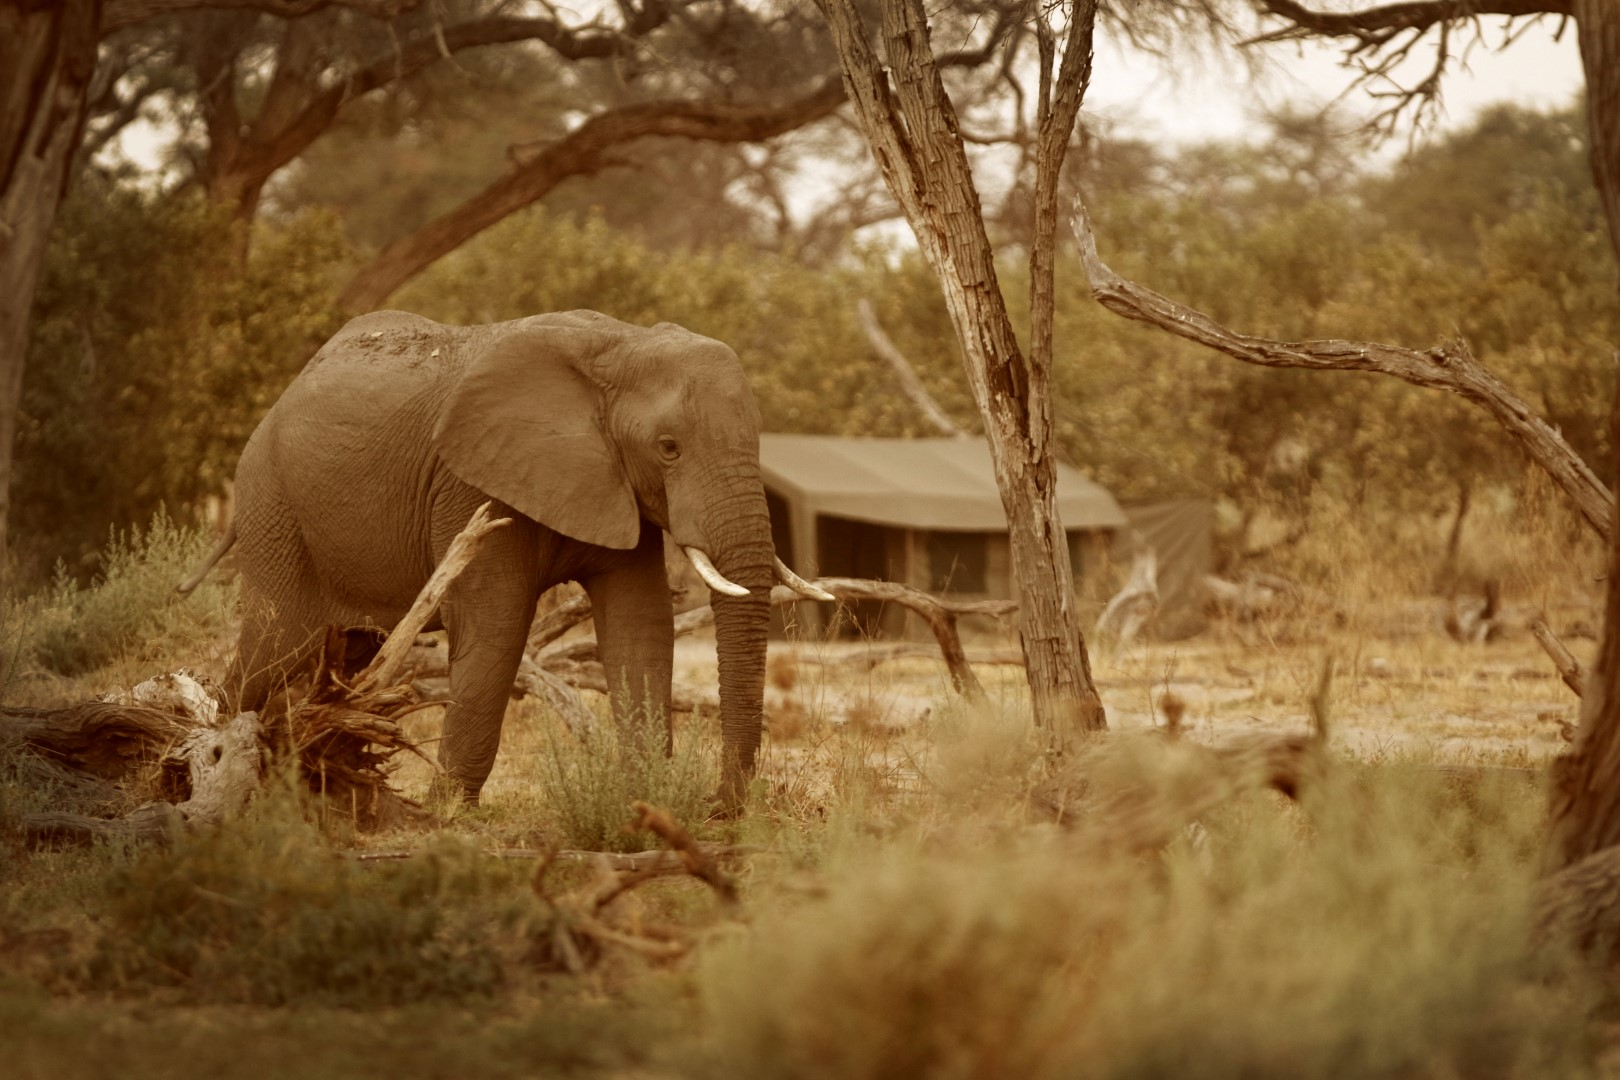 Elephant Tent Sepia 209323 (Large)